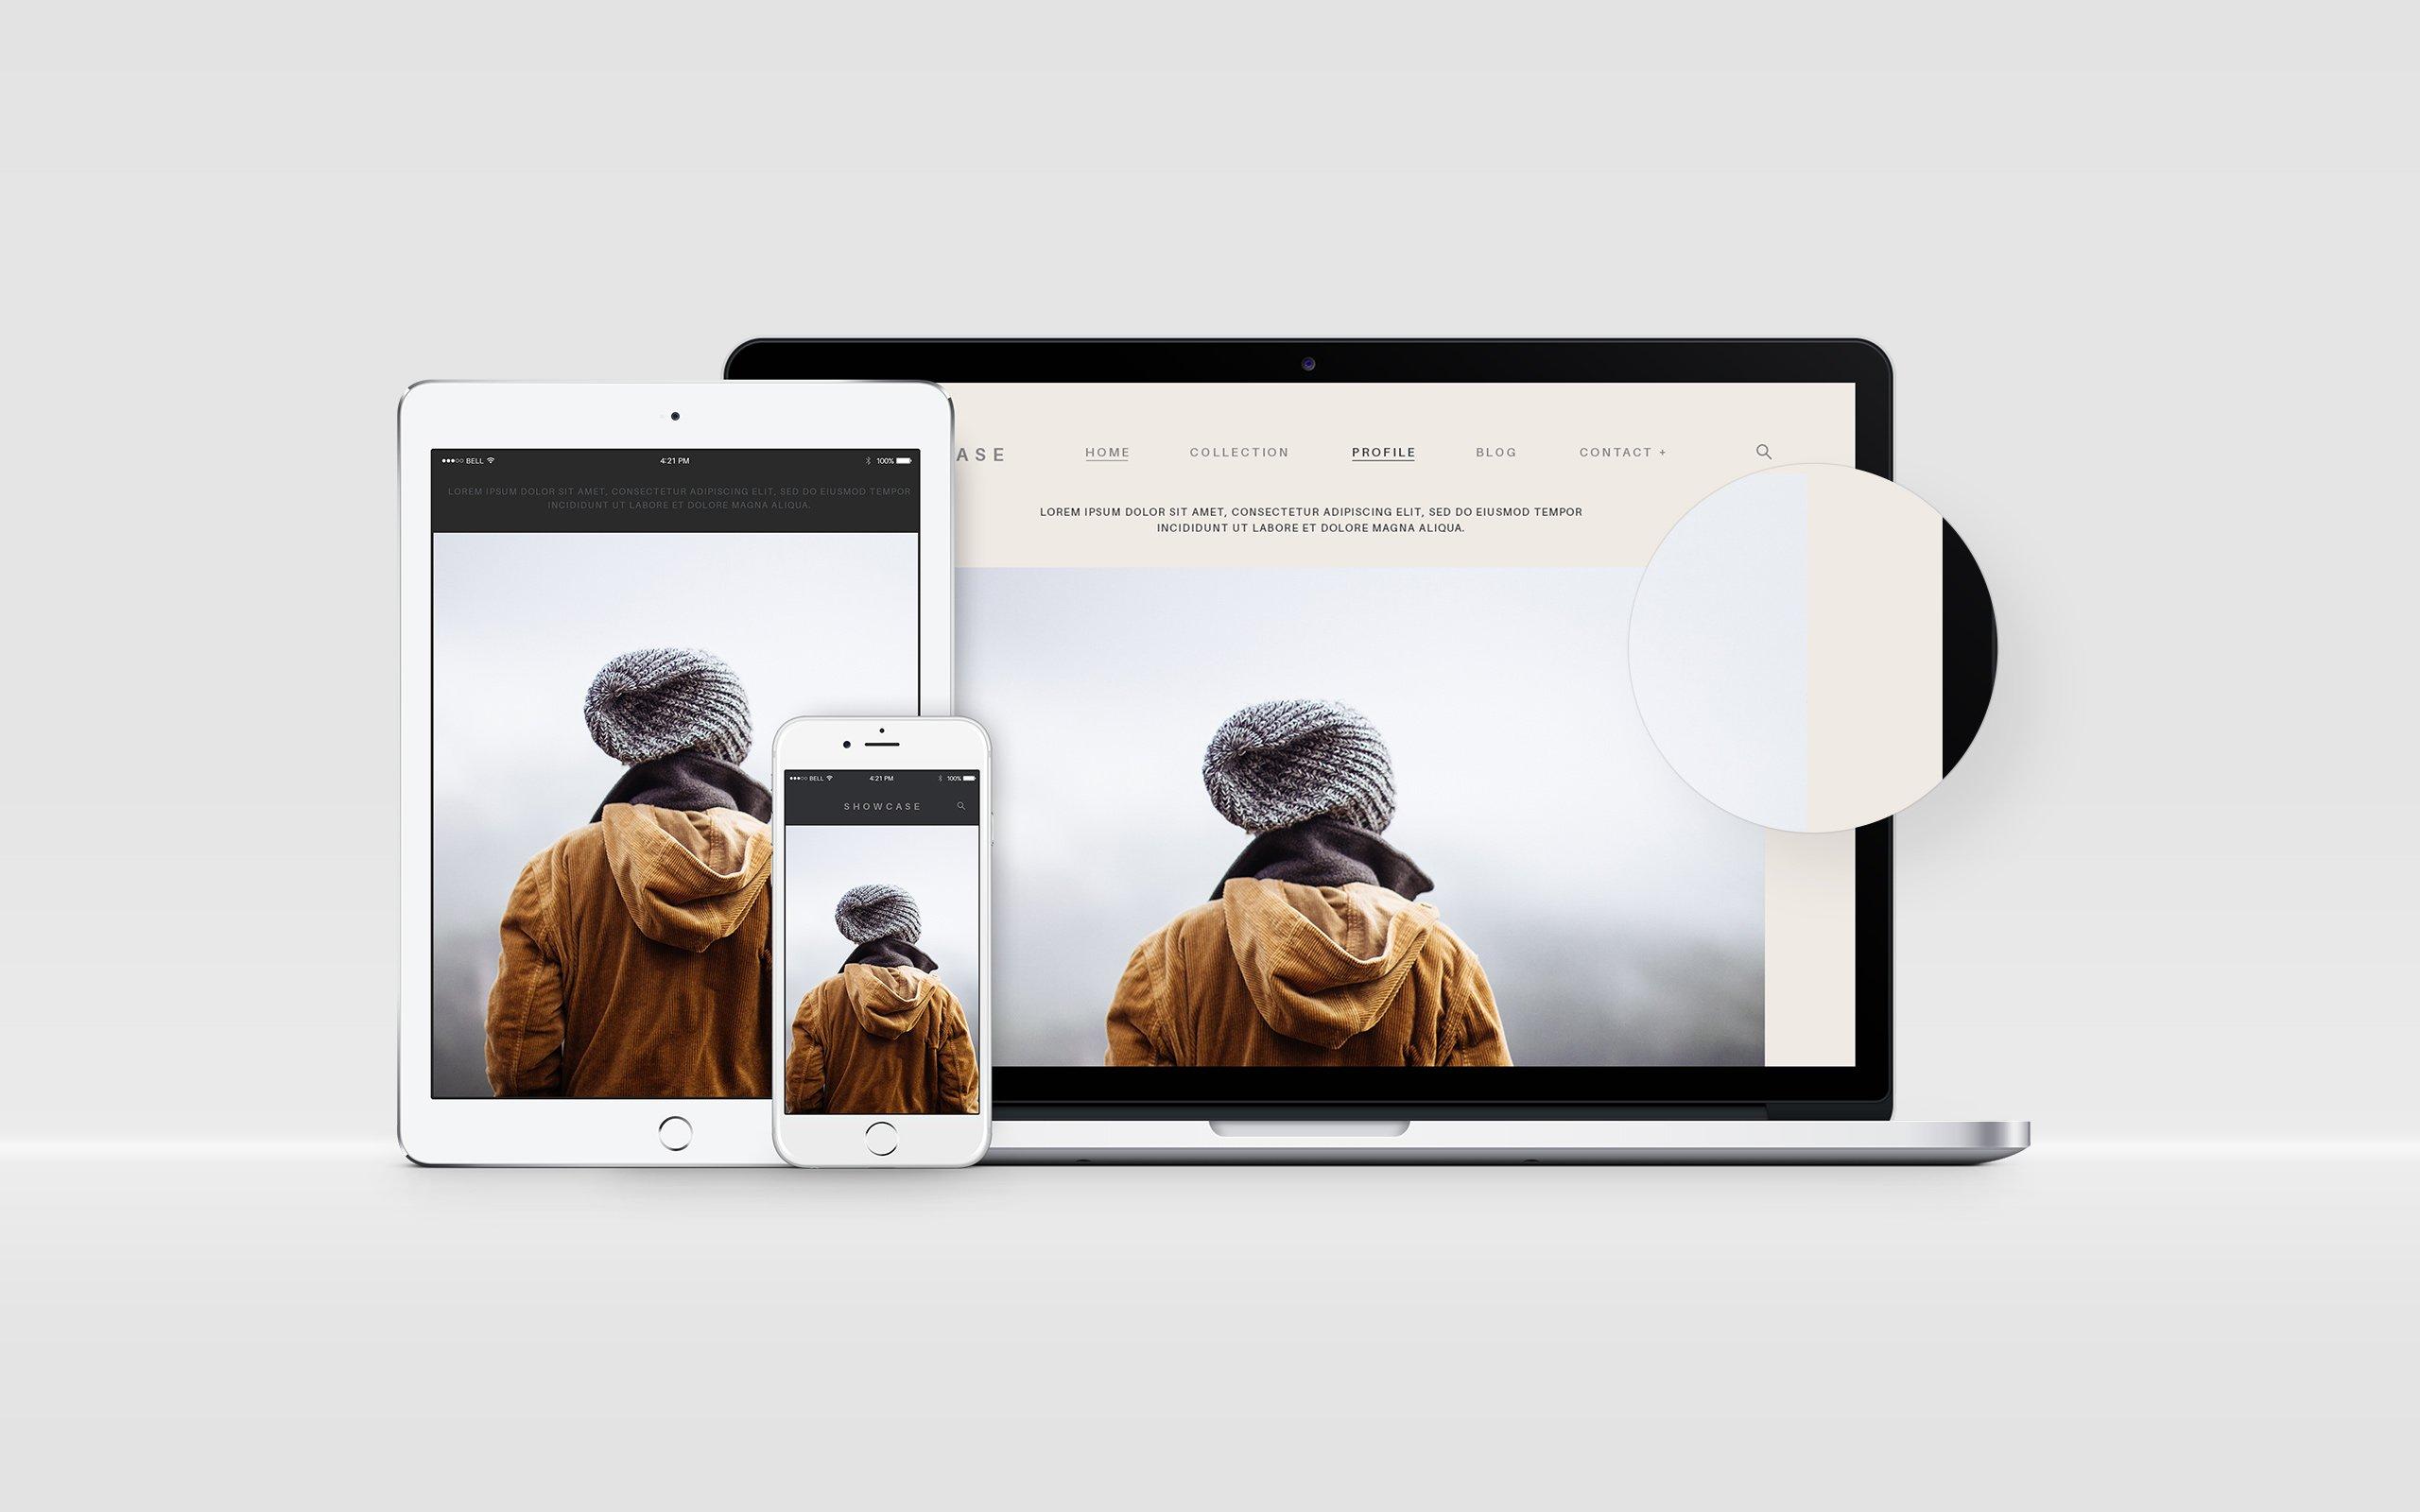 Multi platfrom website design kingwood,tx